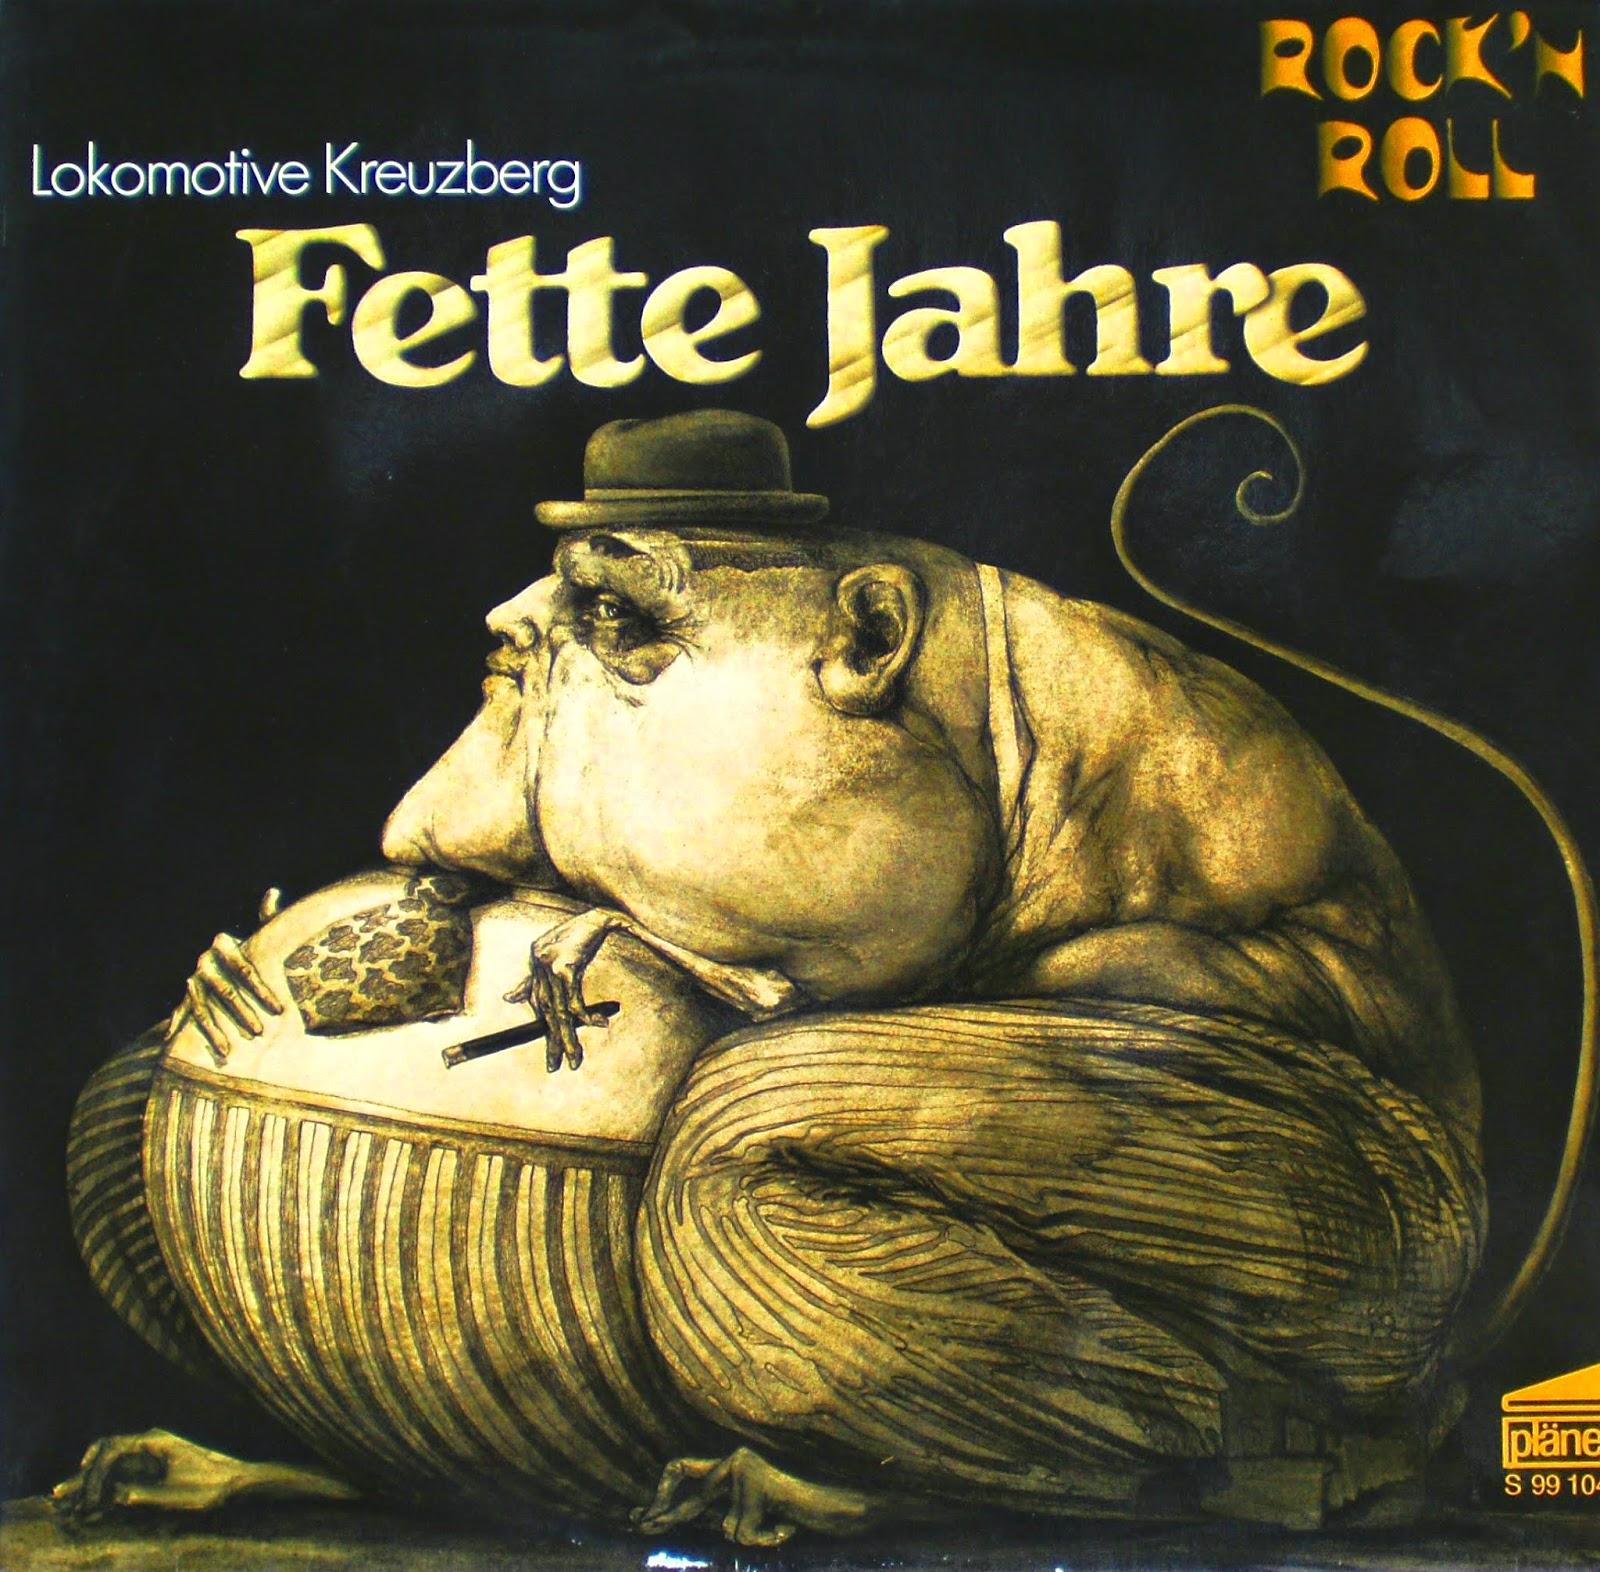 Lokomotive Kreuzberg Fette Jahre (1972)